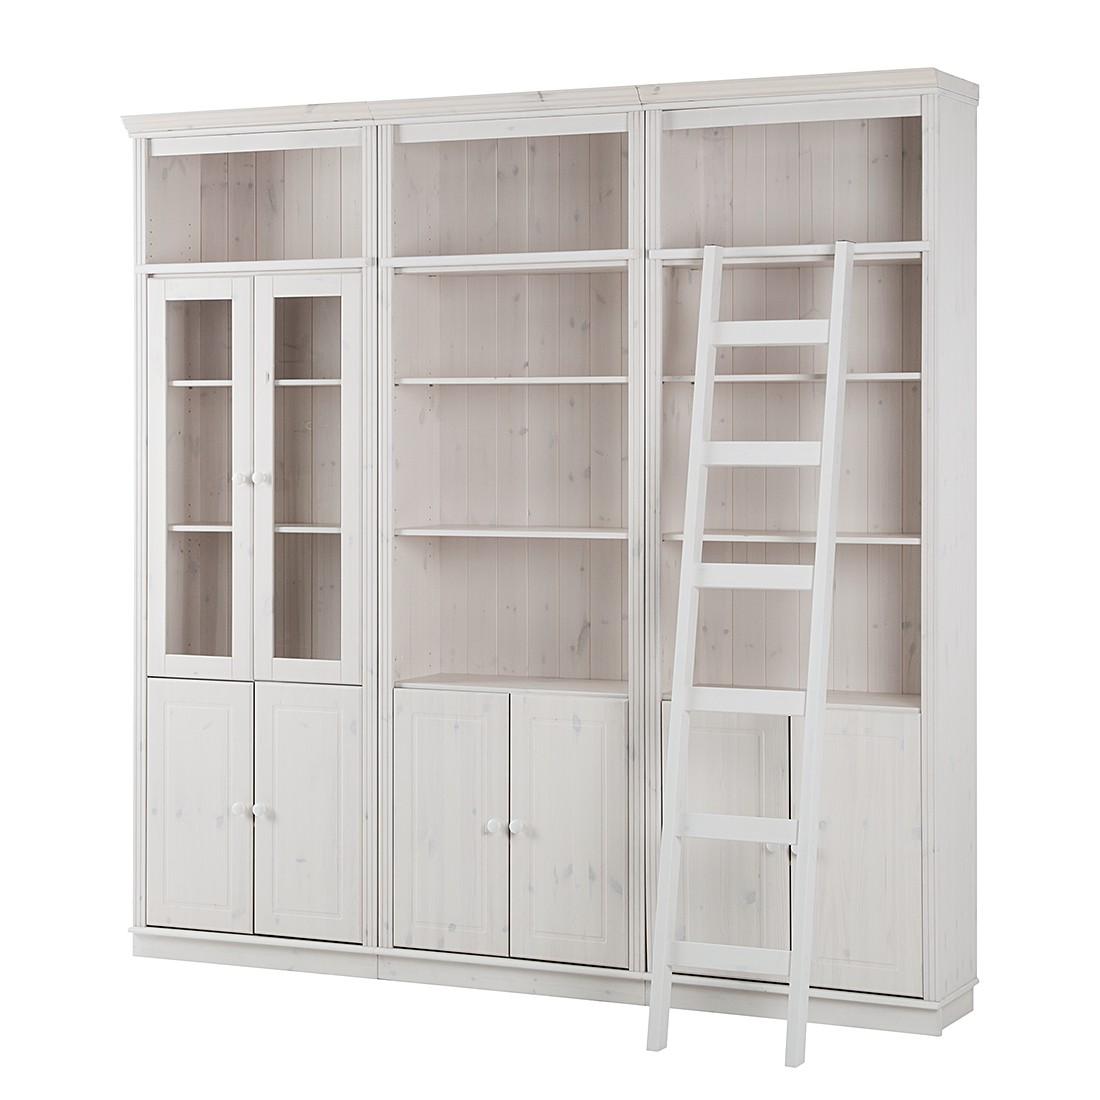 Home 24 - Ensemble de meubles tv lillehammer ii - pin massif verni blanc vernis, maison belfort